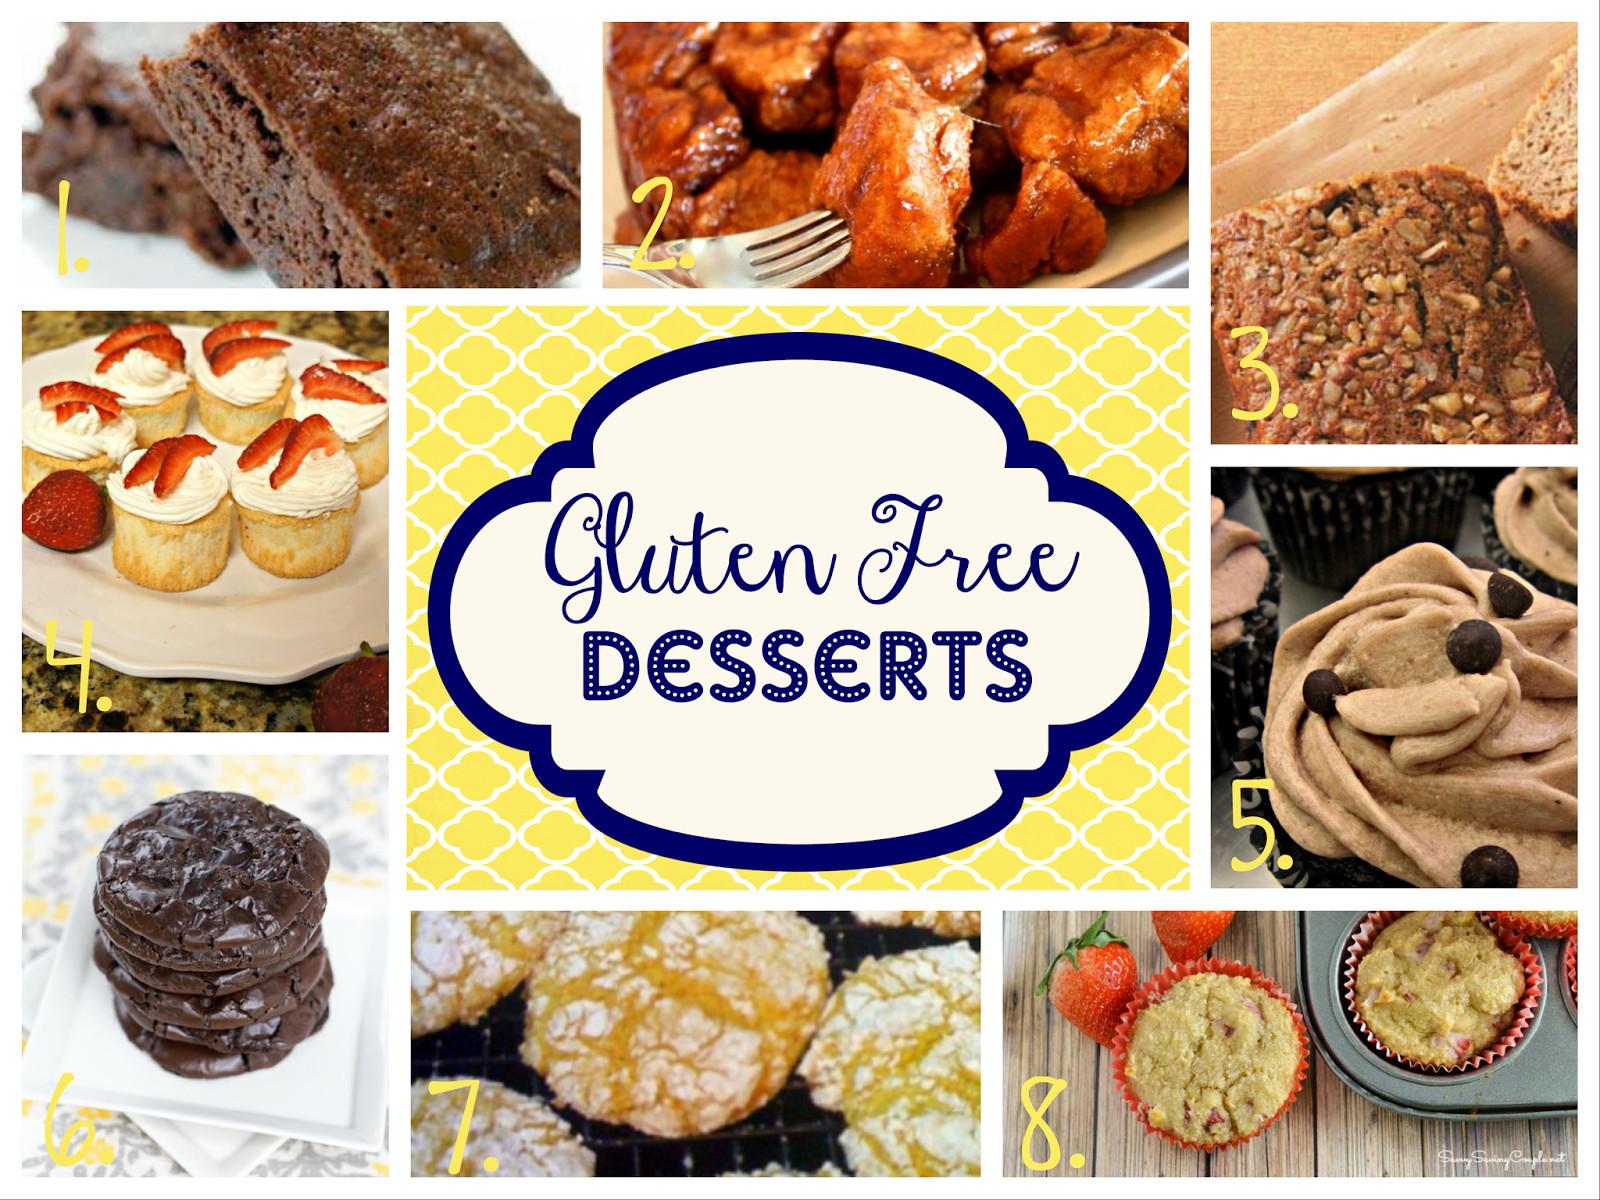 Gluten Free Desserts Recipes  Storage Grace GLUTEN FREE Dessert Recipes Easy